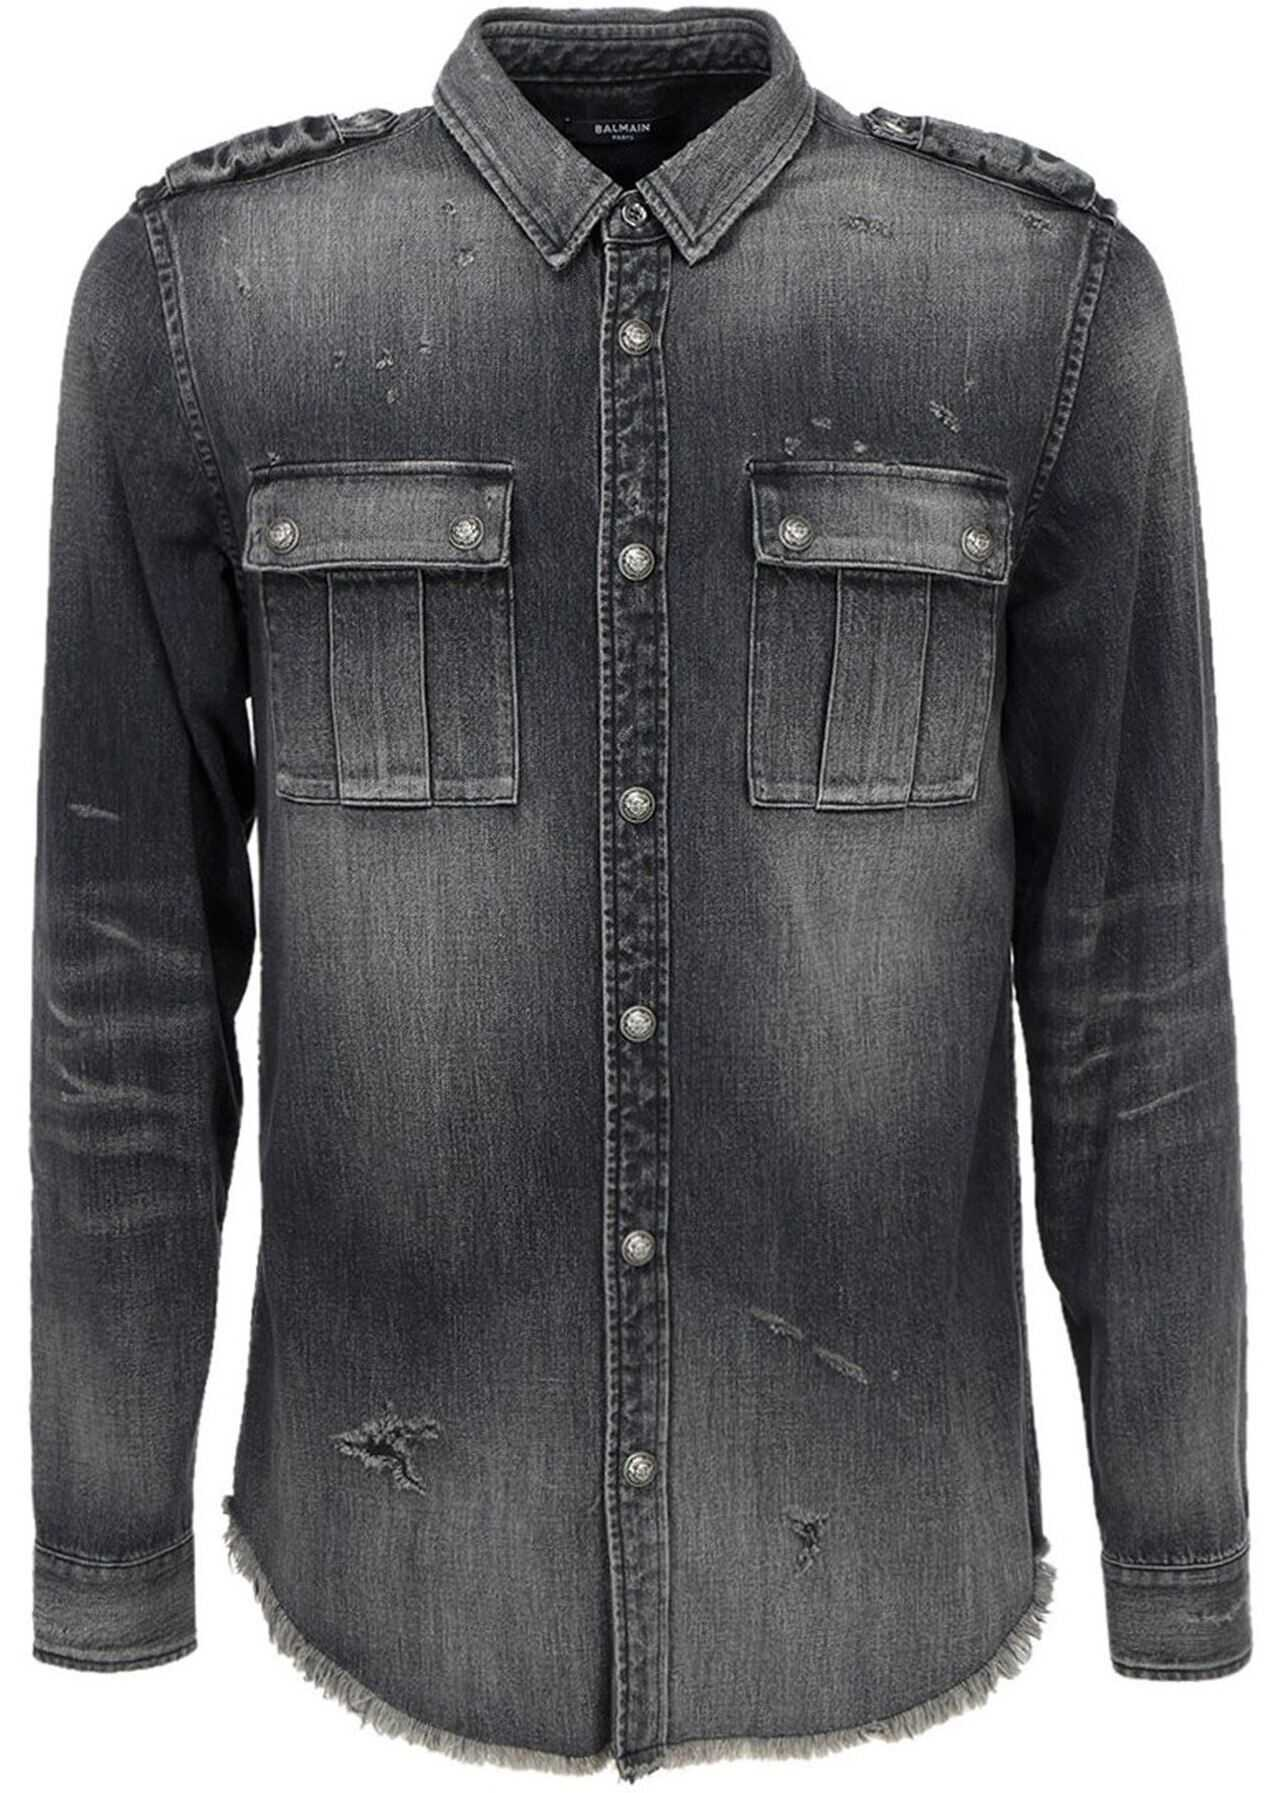 Balmain Denim Shirt In Grey Grey imagine